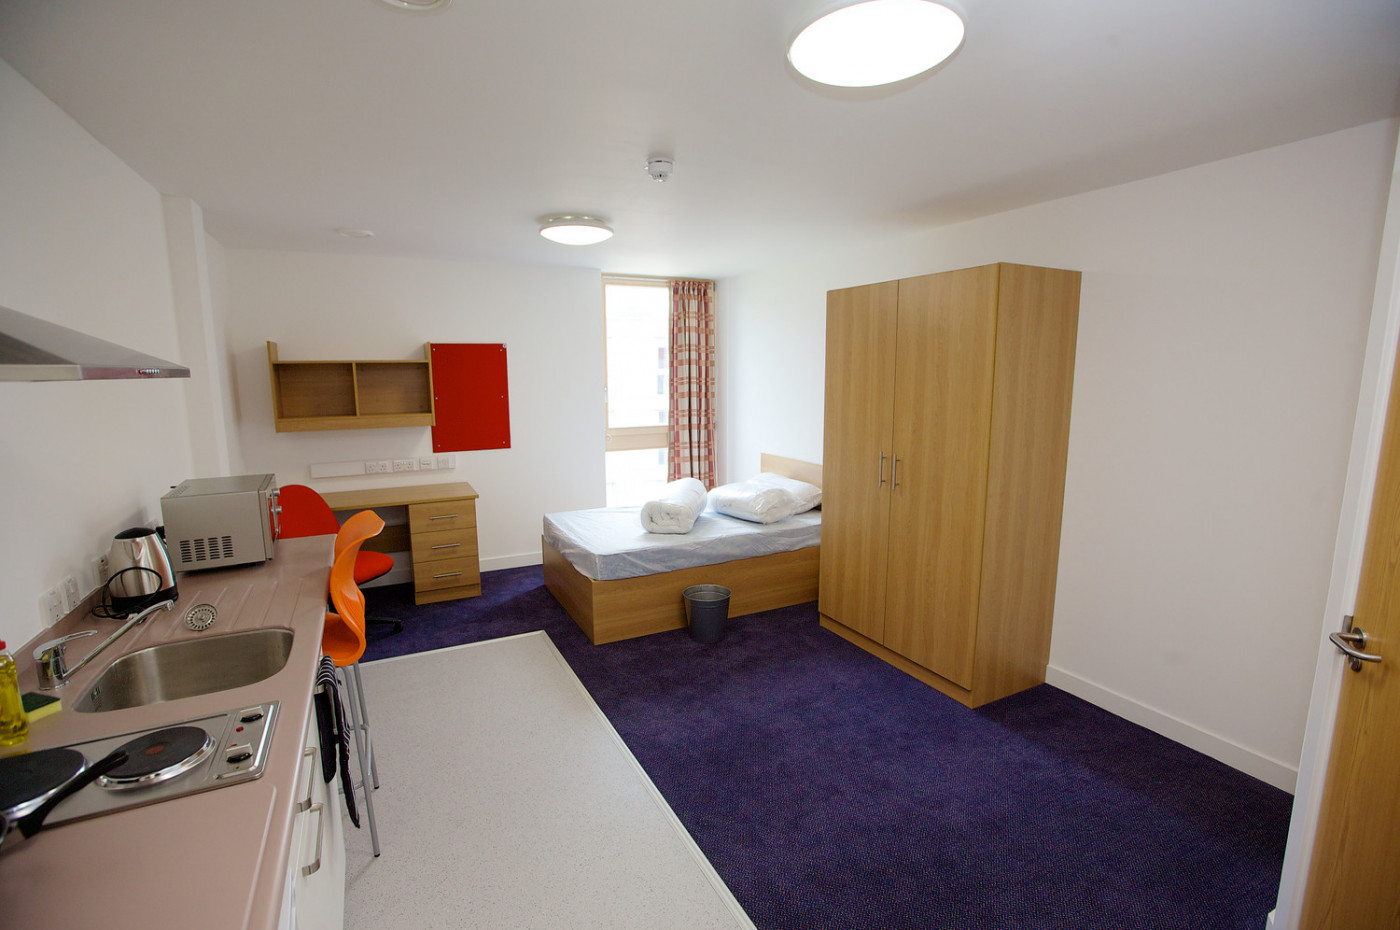 Studio room with private kitchen facilities